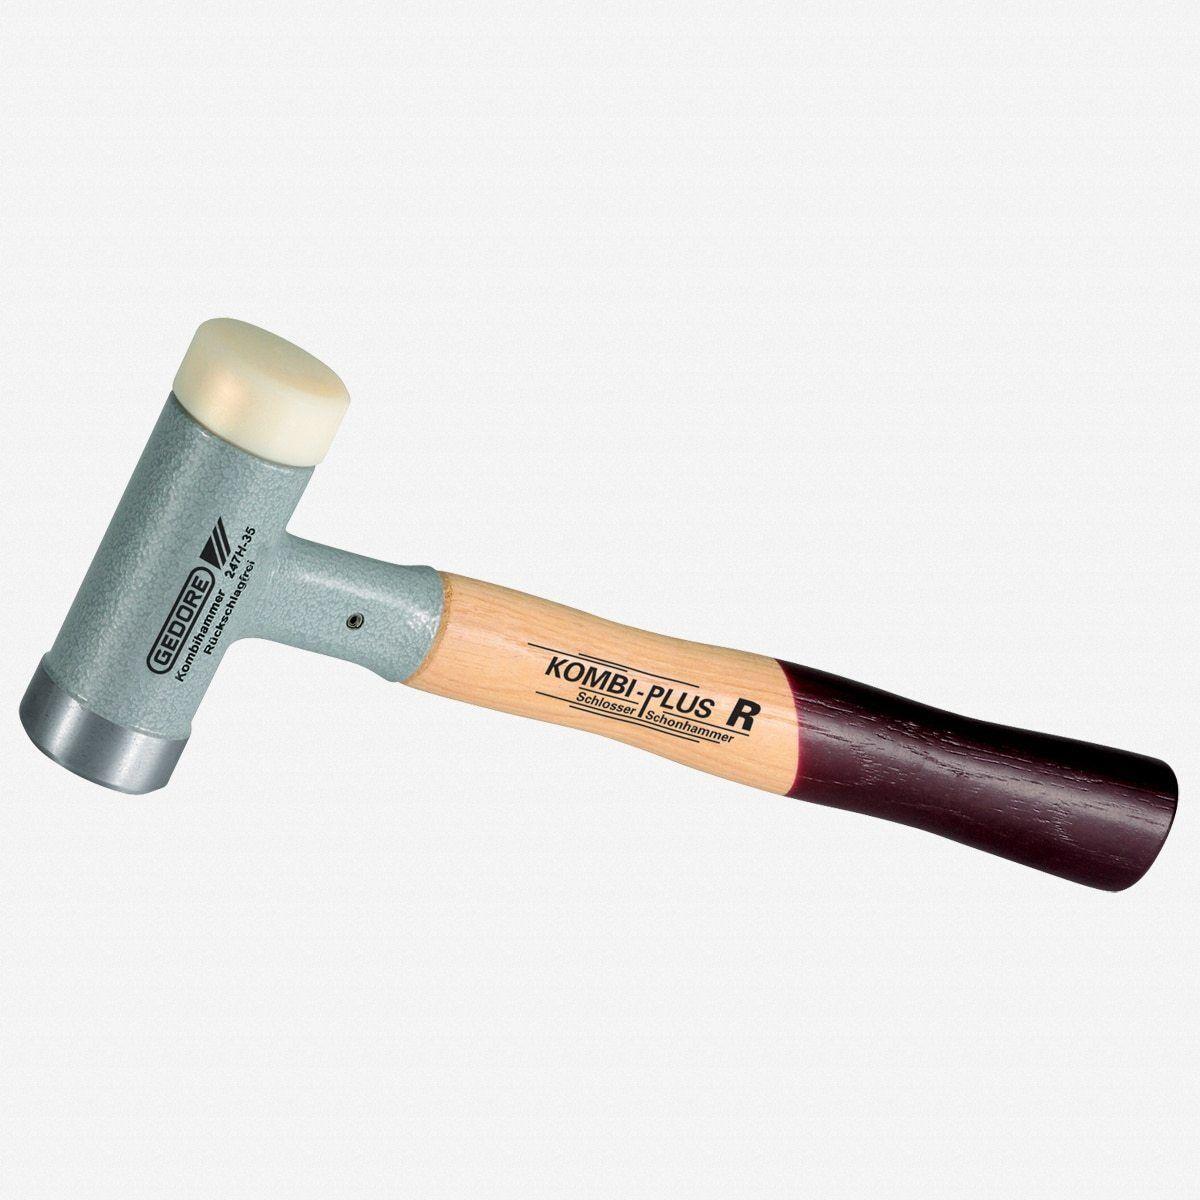 Gedore 247 H-35 Combination hammer KOMBI-PLUS R 35 mm